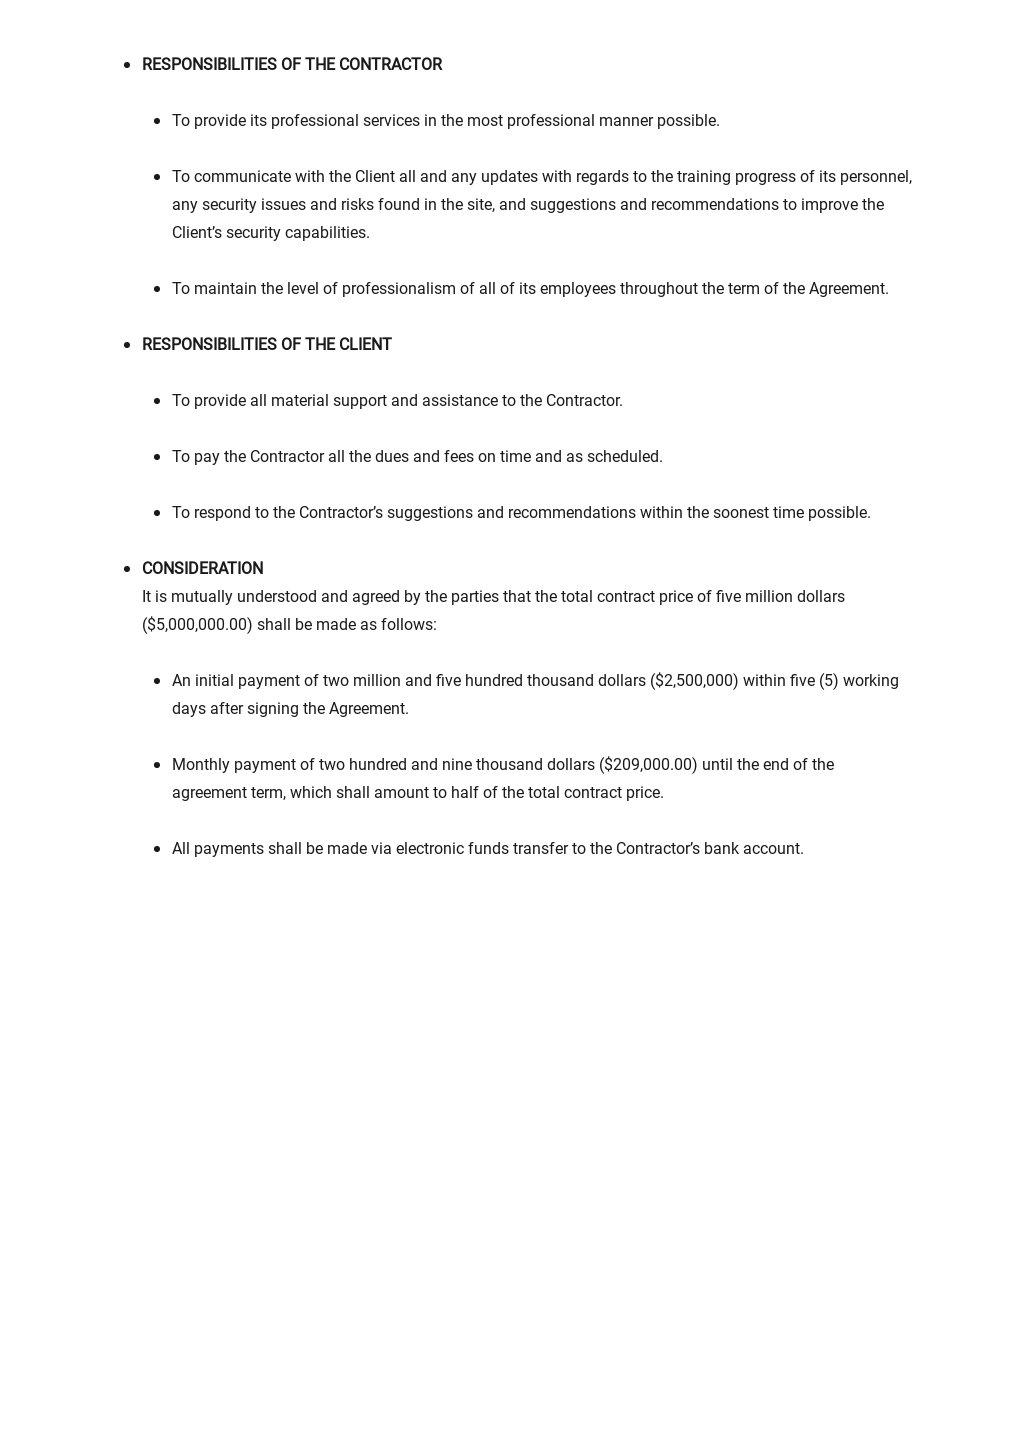 Sample Memorandum of Understanding Template 2.jpe